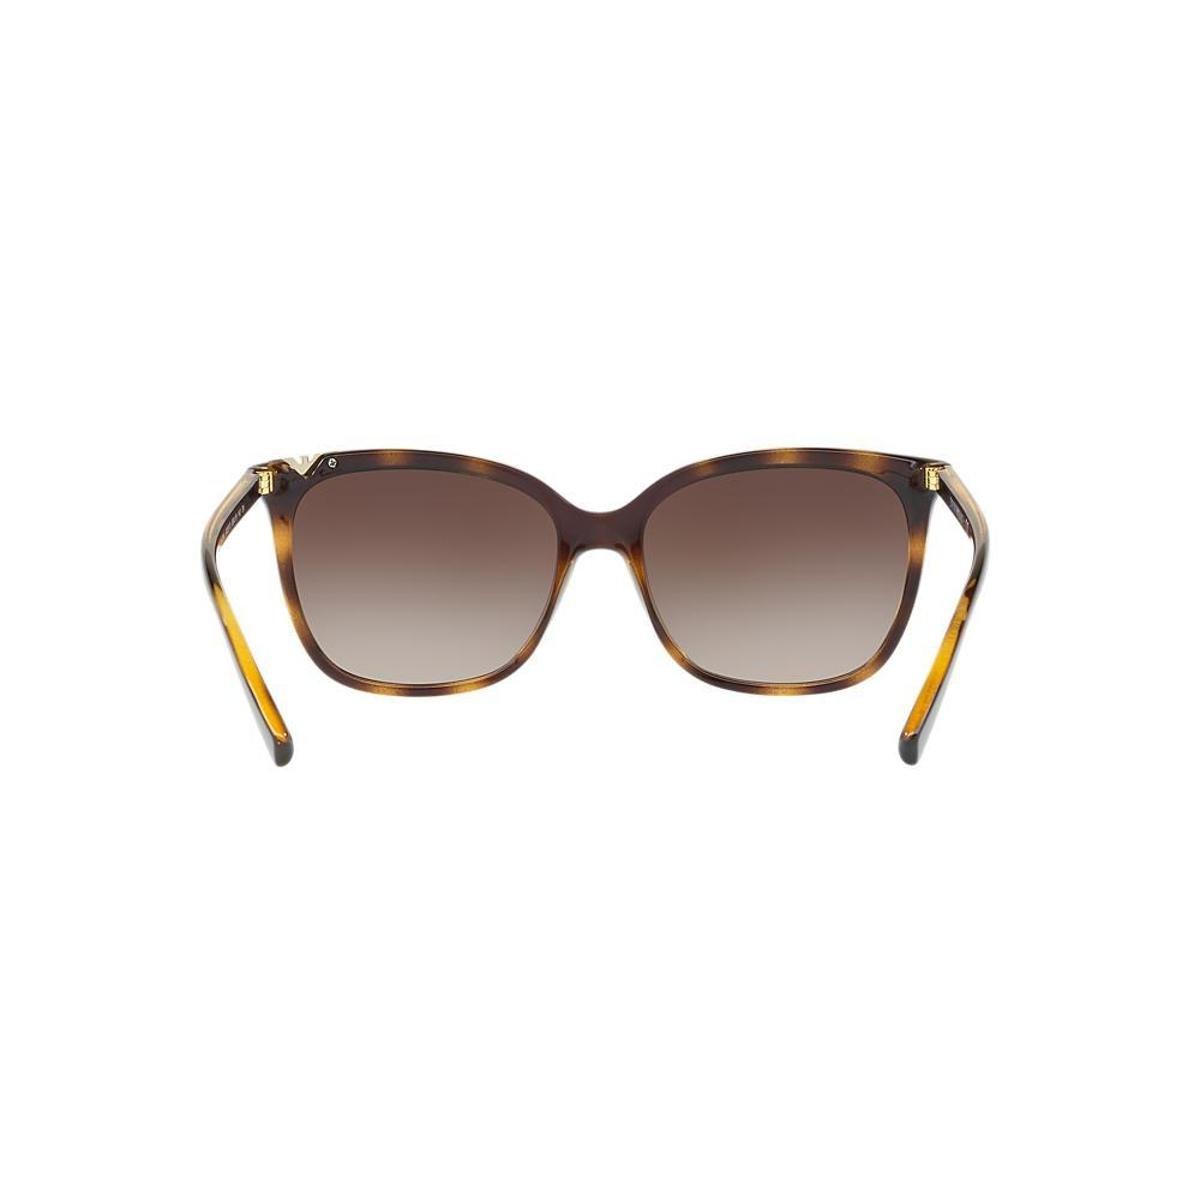 Óculos de Sol Emporio Armani Quadrado EA4094 Feminino - Compre Agora ... cdd4bf116d